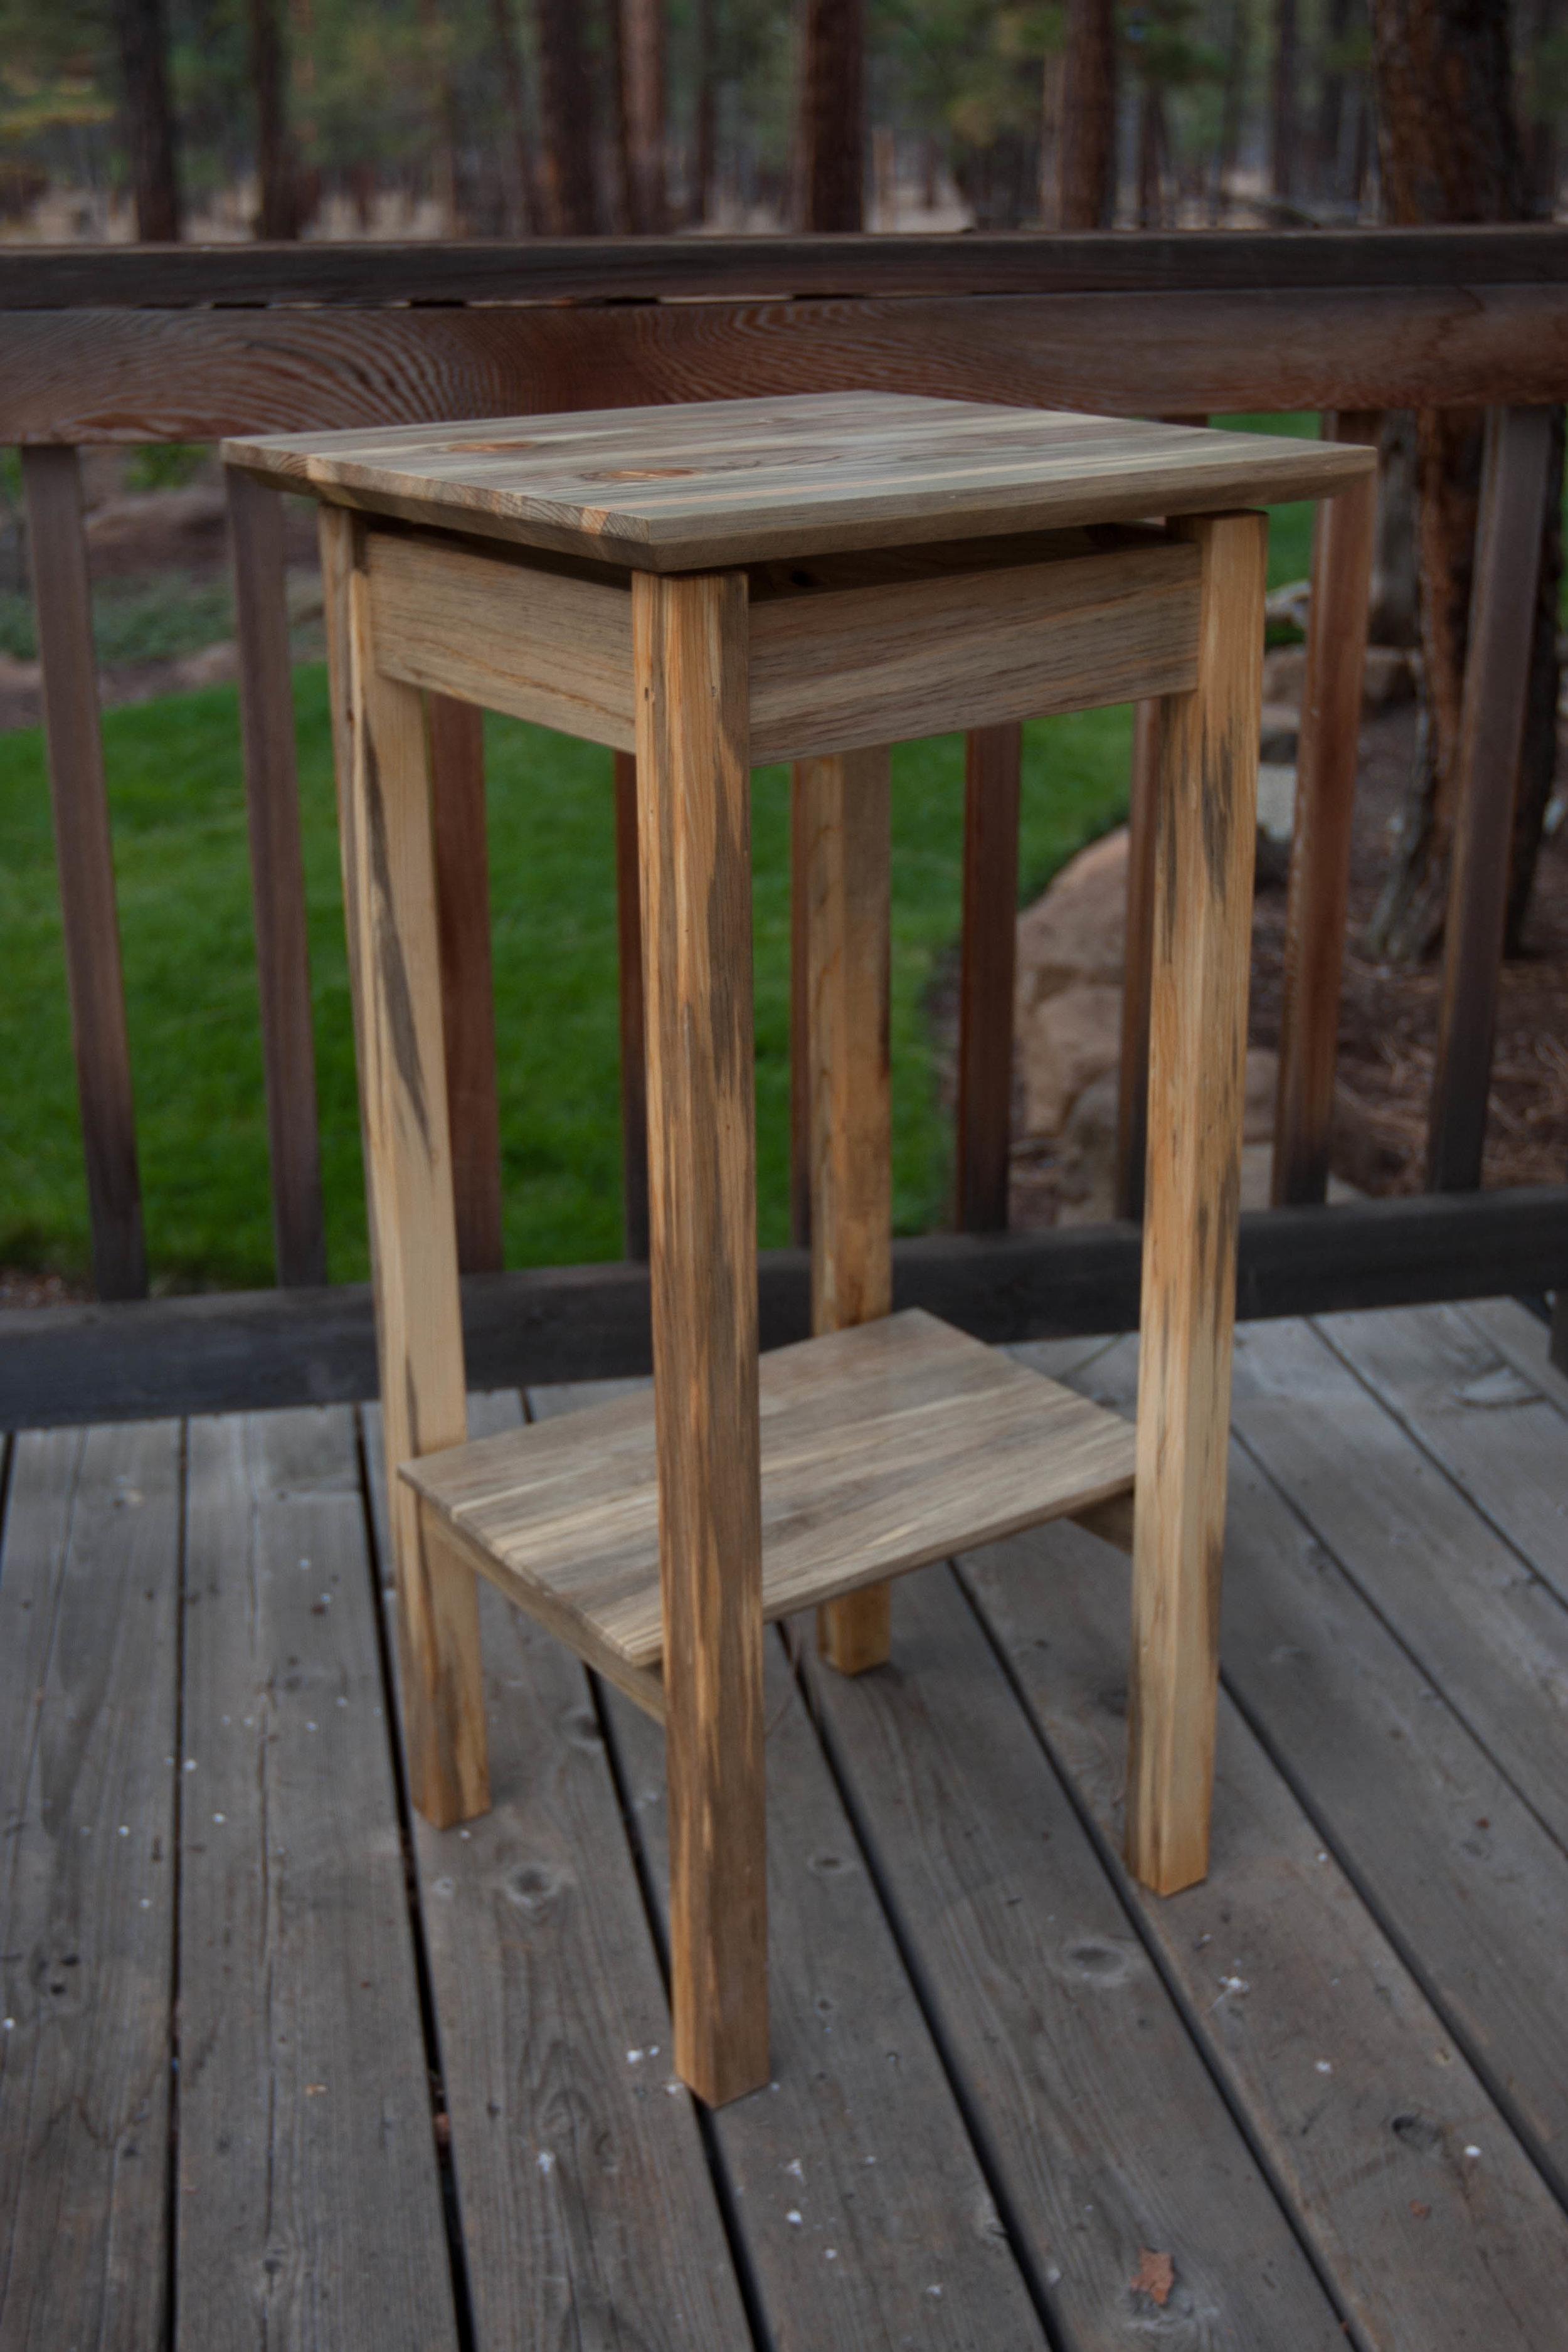 Pine Pedestal with Shelf by Bob Bousquet